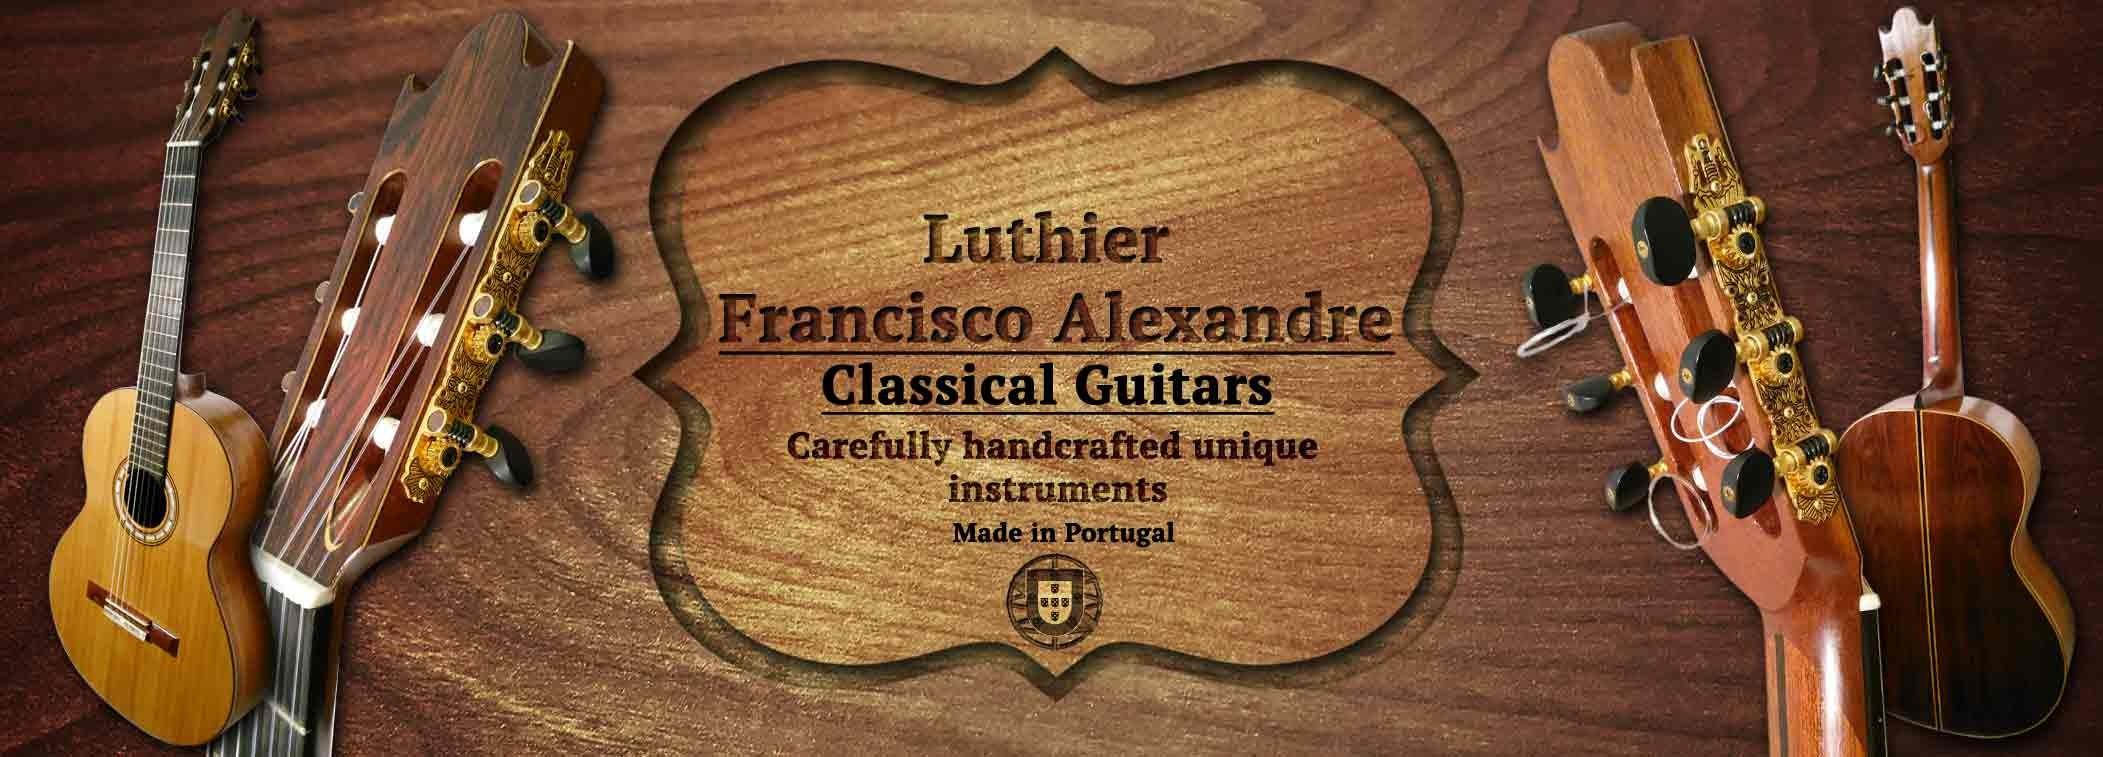 Classical Guita luthier Francisco Alexandre